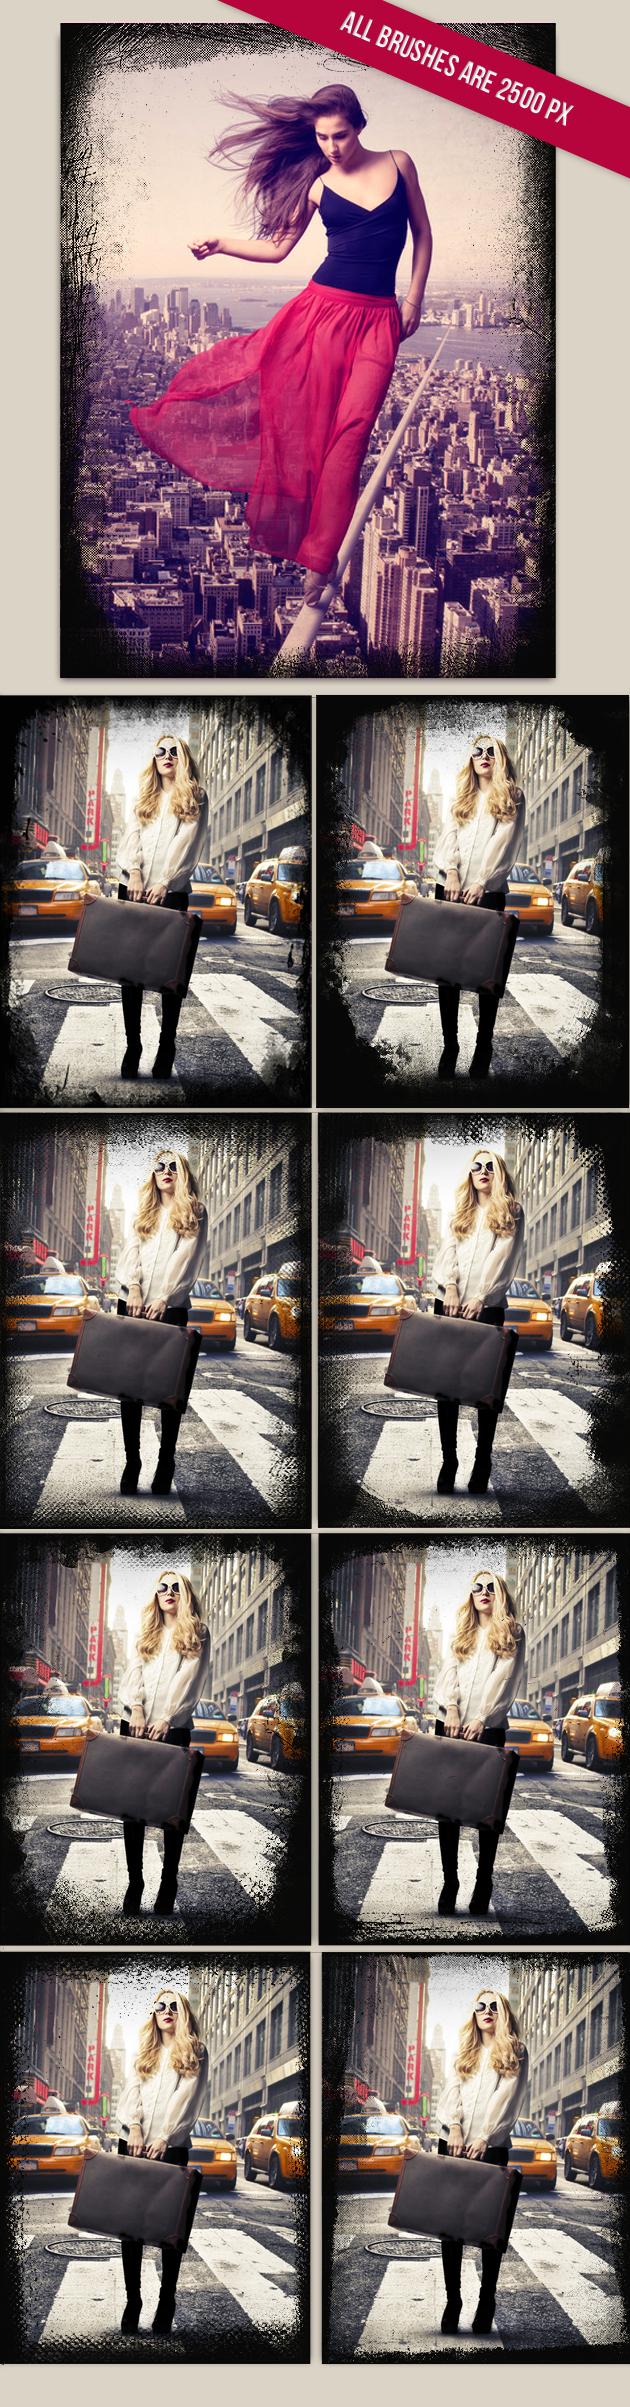 Grunge-Frames-Photoshop-Brushes designtnt brushes grunge frames large